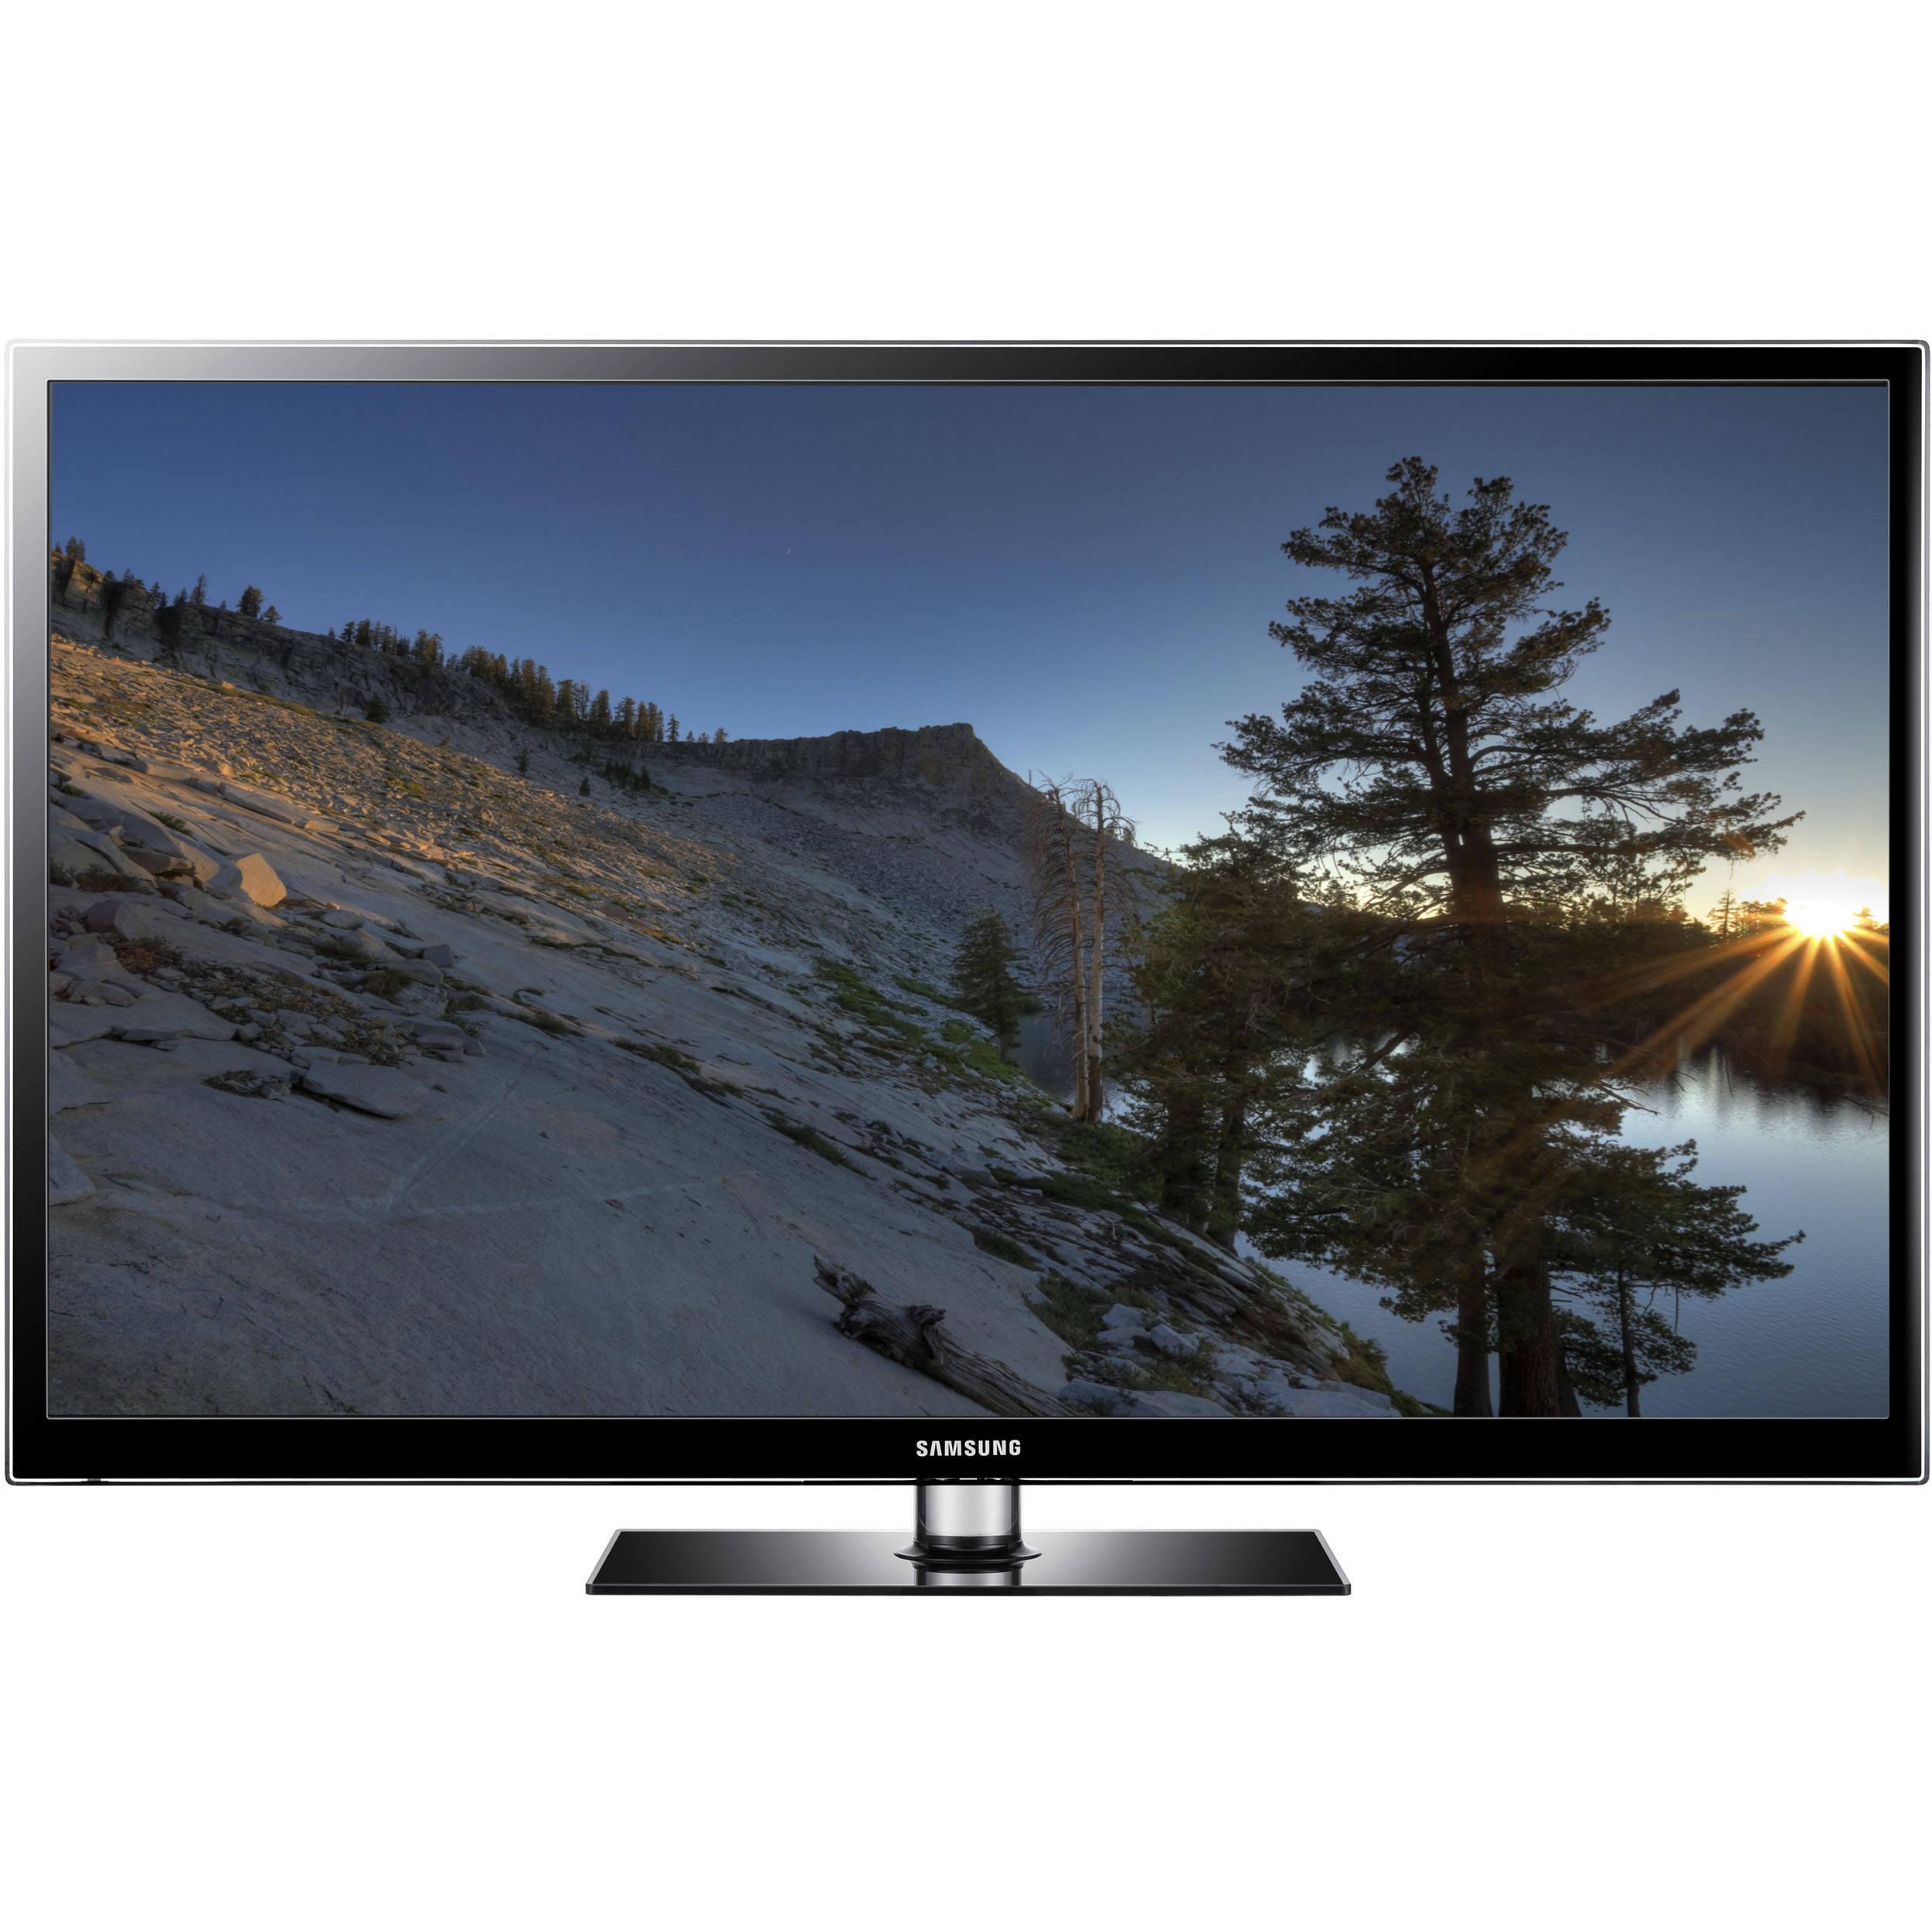 New Samsung LED and Plasma TVs for 2013 | B&H Explora